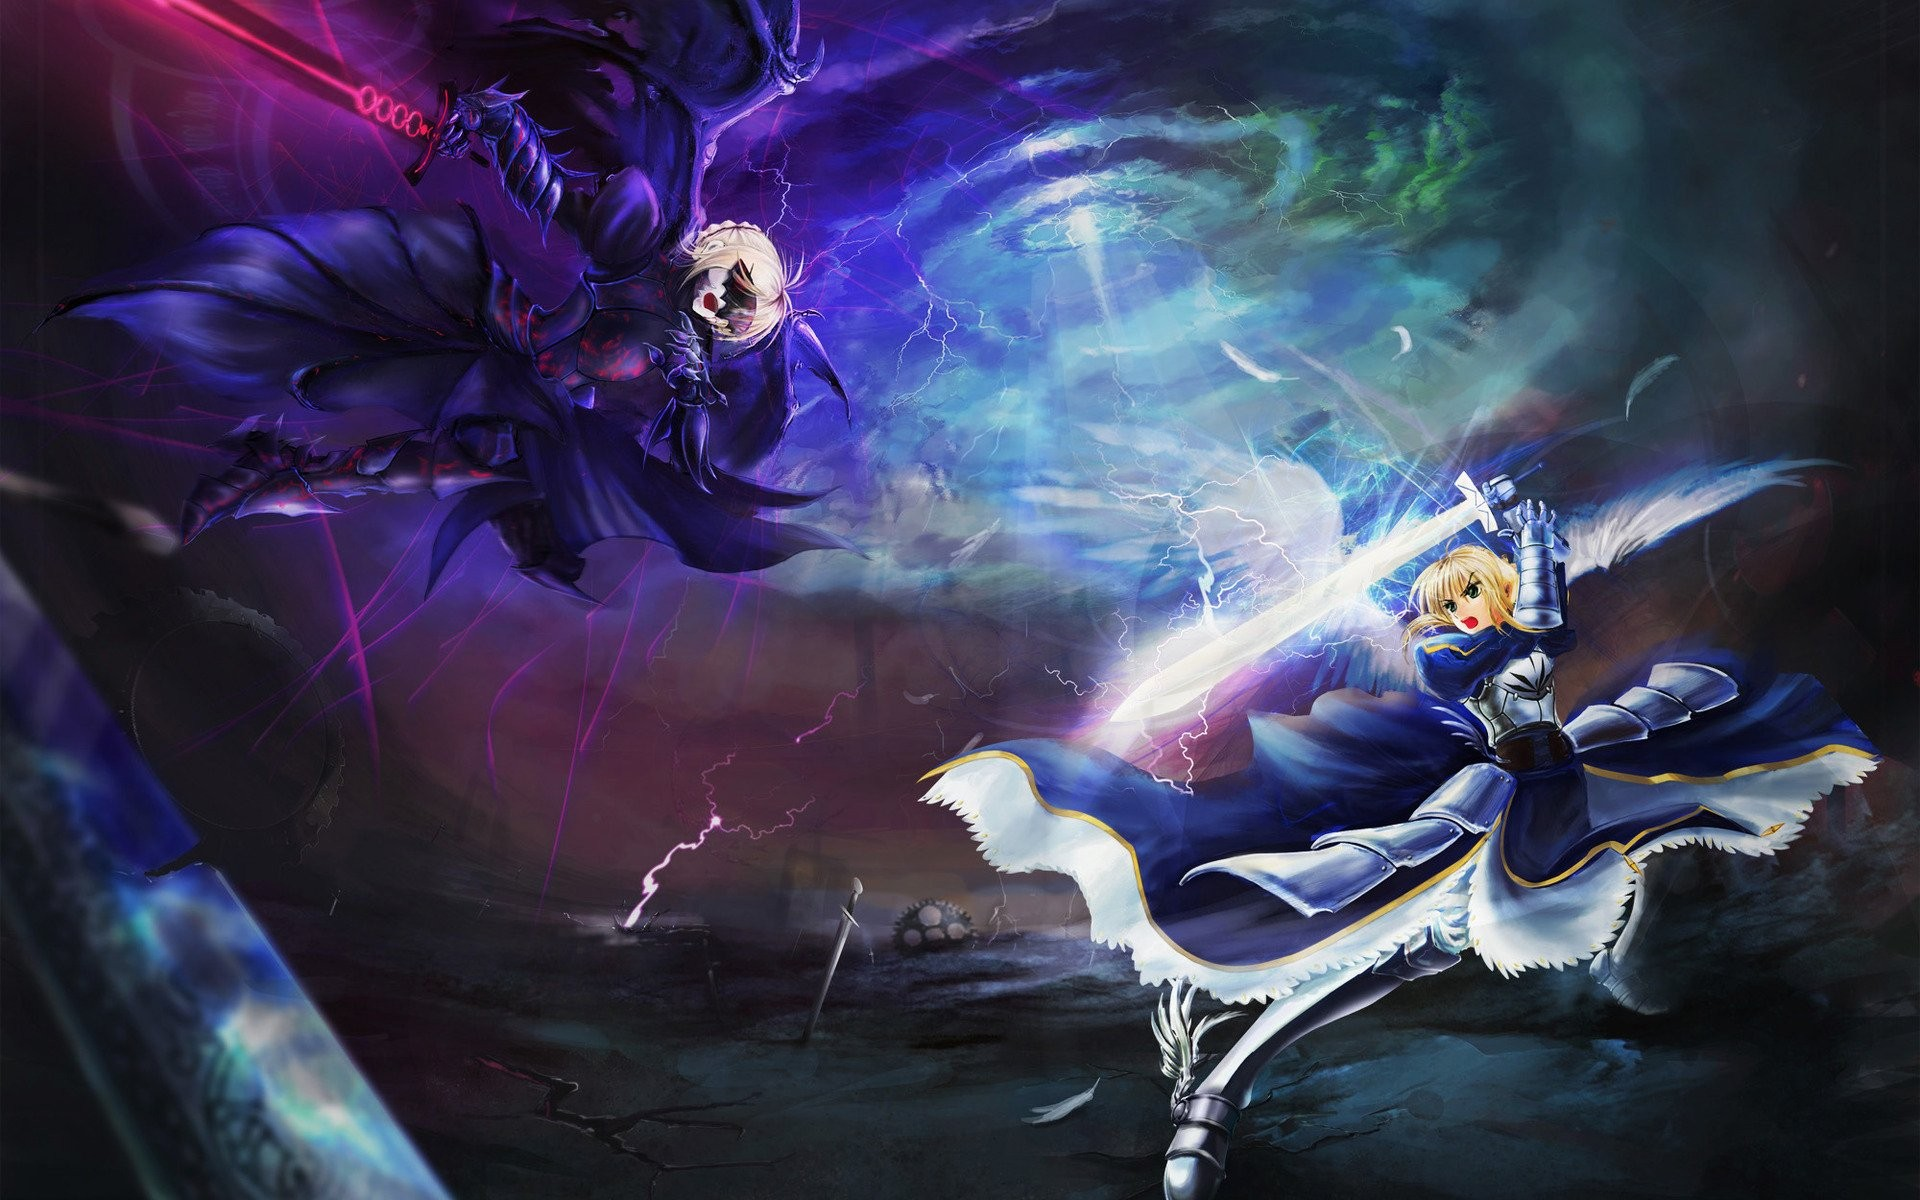 Fate Stay Night wallpaper ·① Download free amazing HD ...